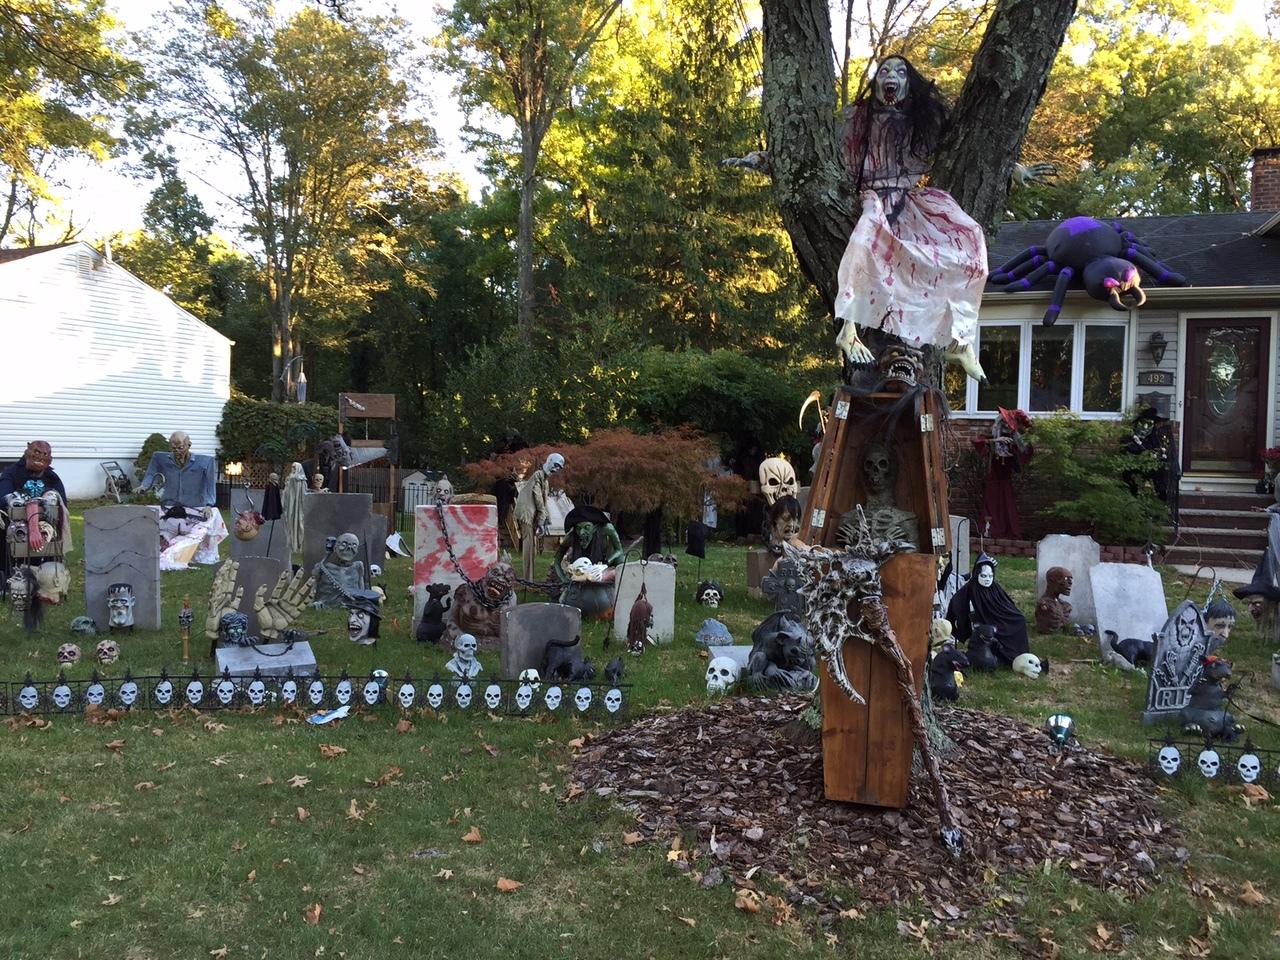 14d19cf94de92e75cca0_Halloween_decoration_-_North_Ave_graveyard.jpg